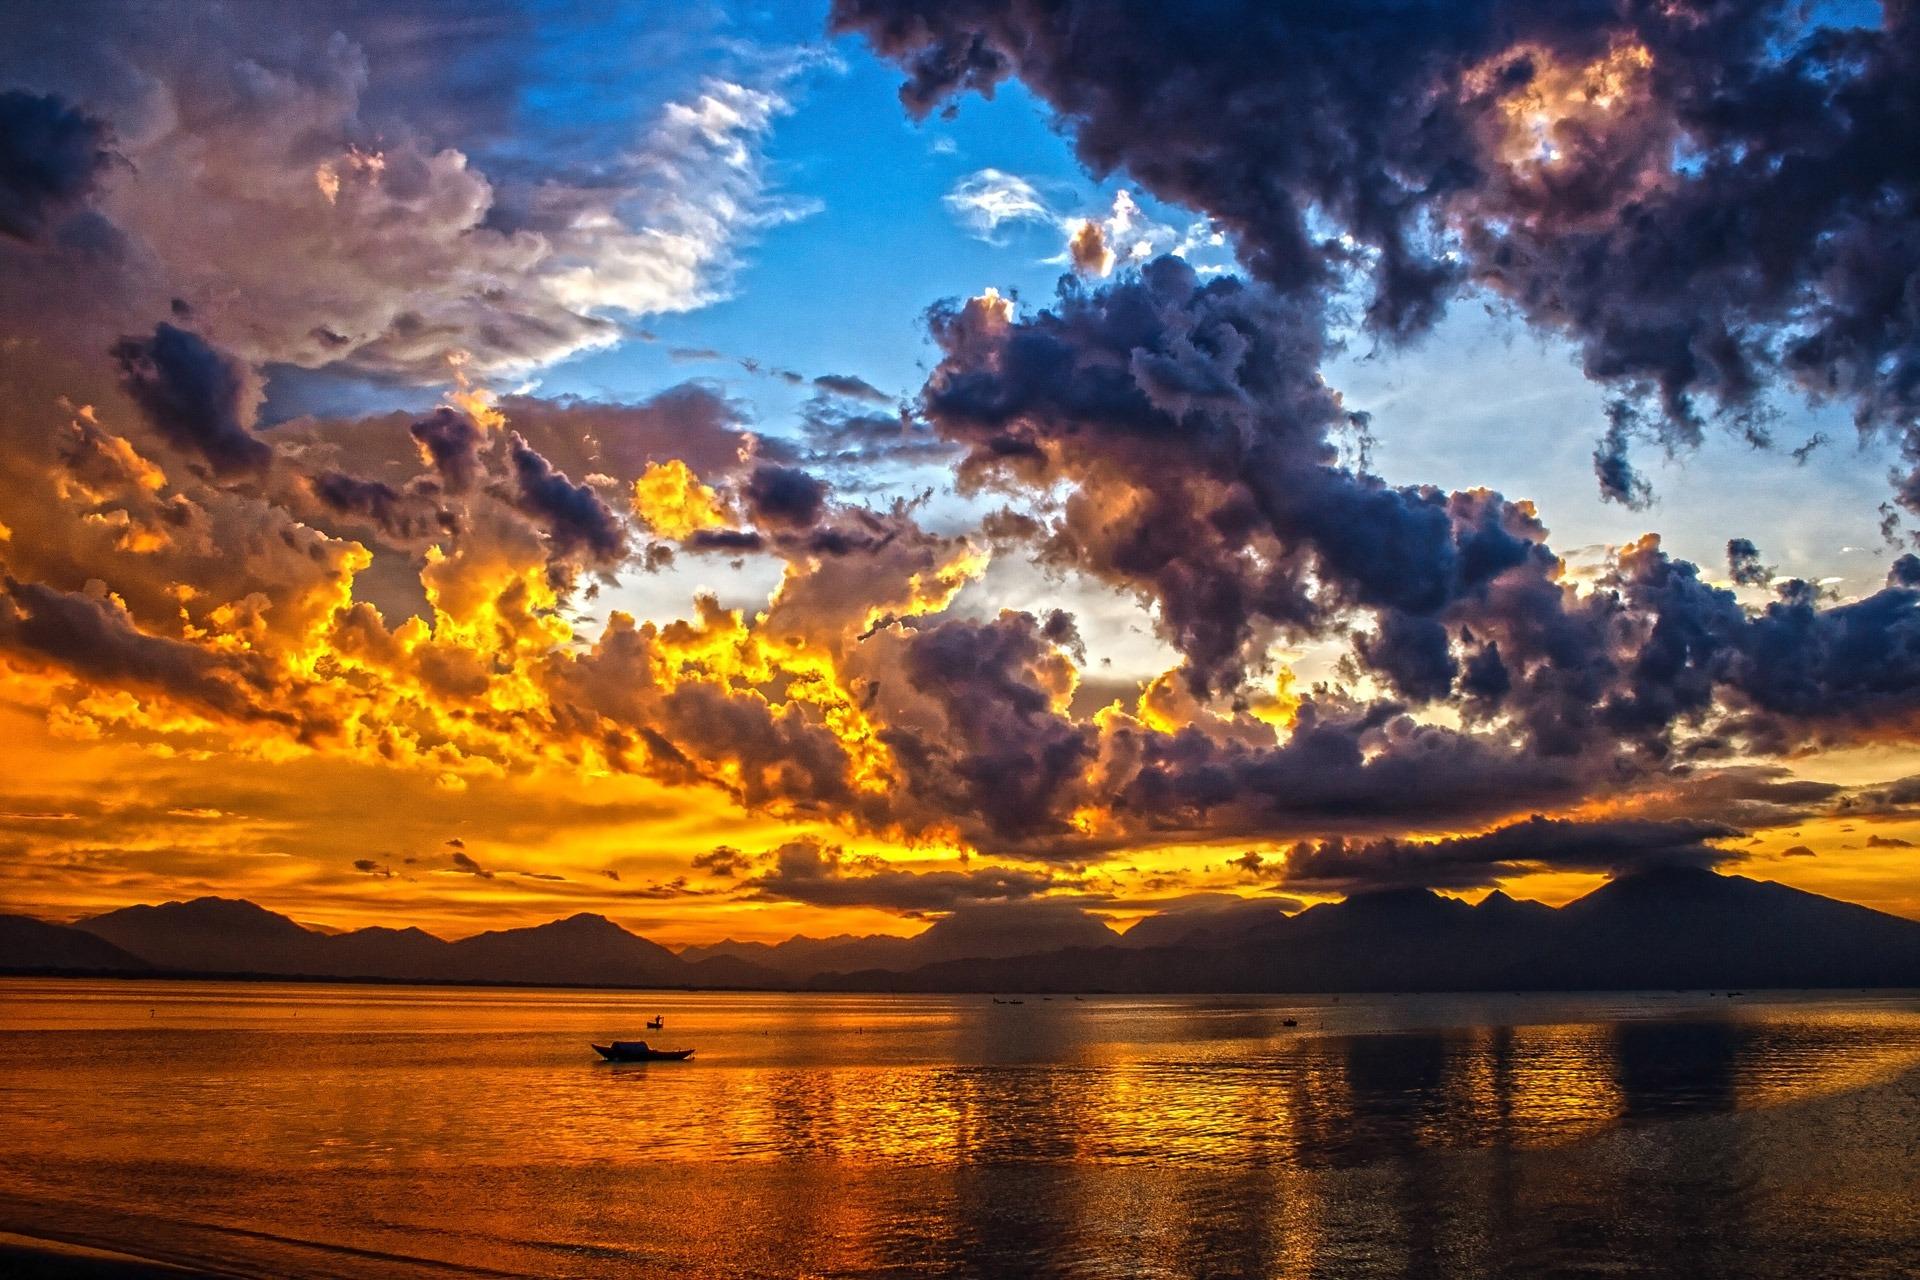 Wallpaper Hd Happy New Year Free Stock Photo Of Boat Clouds Da Nang Bay